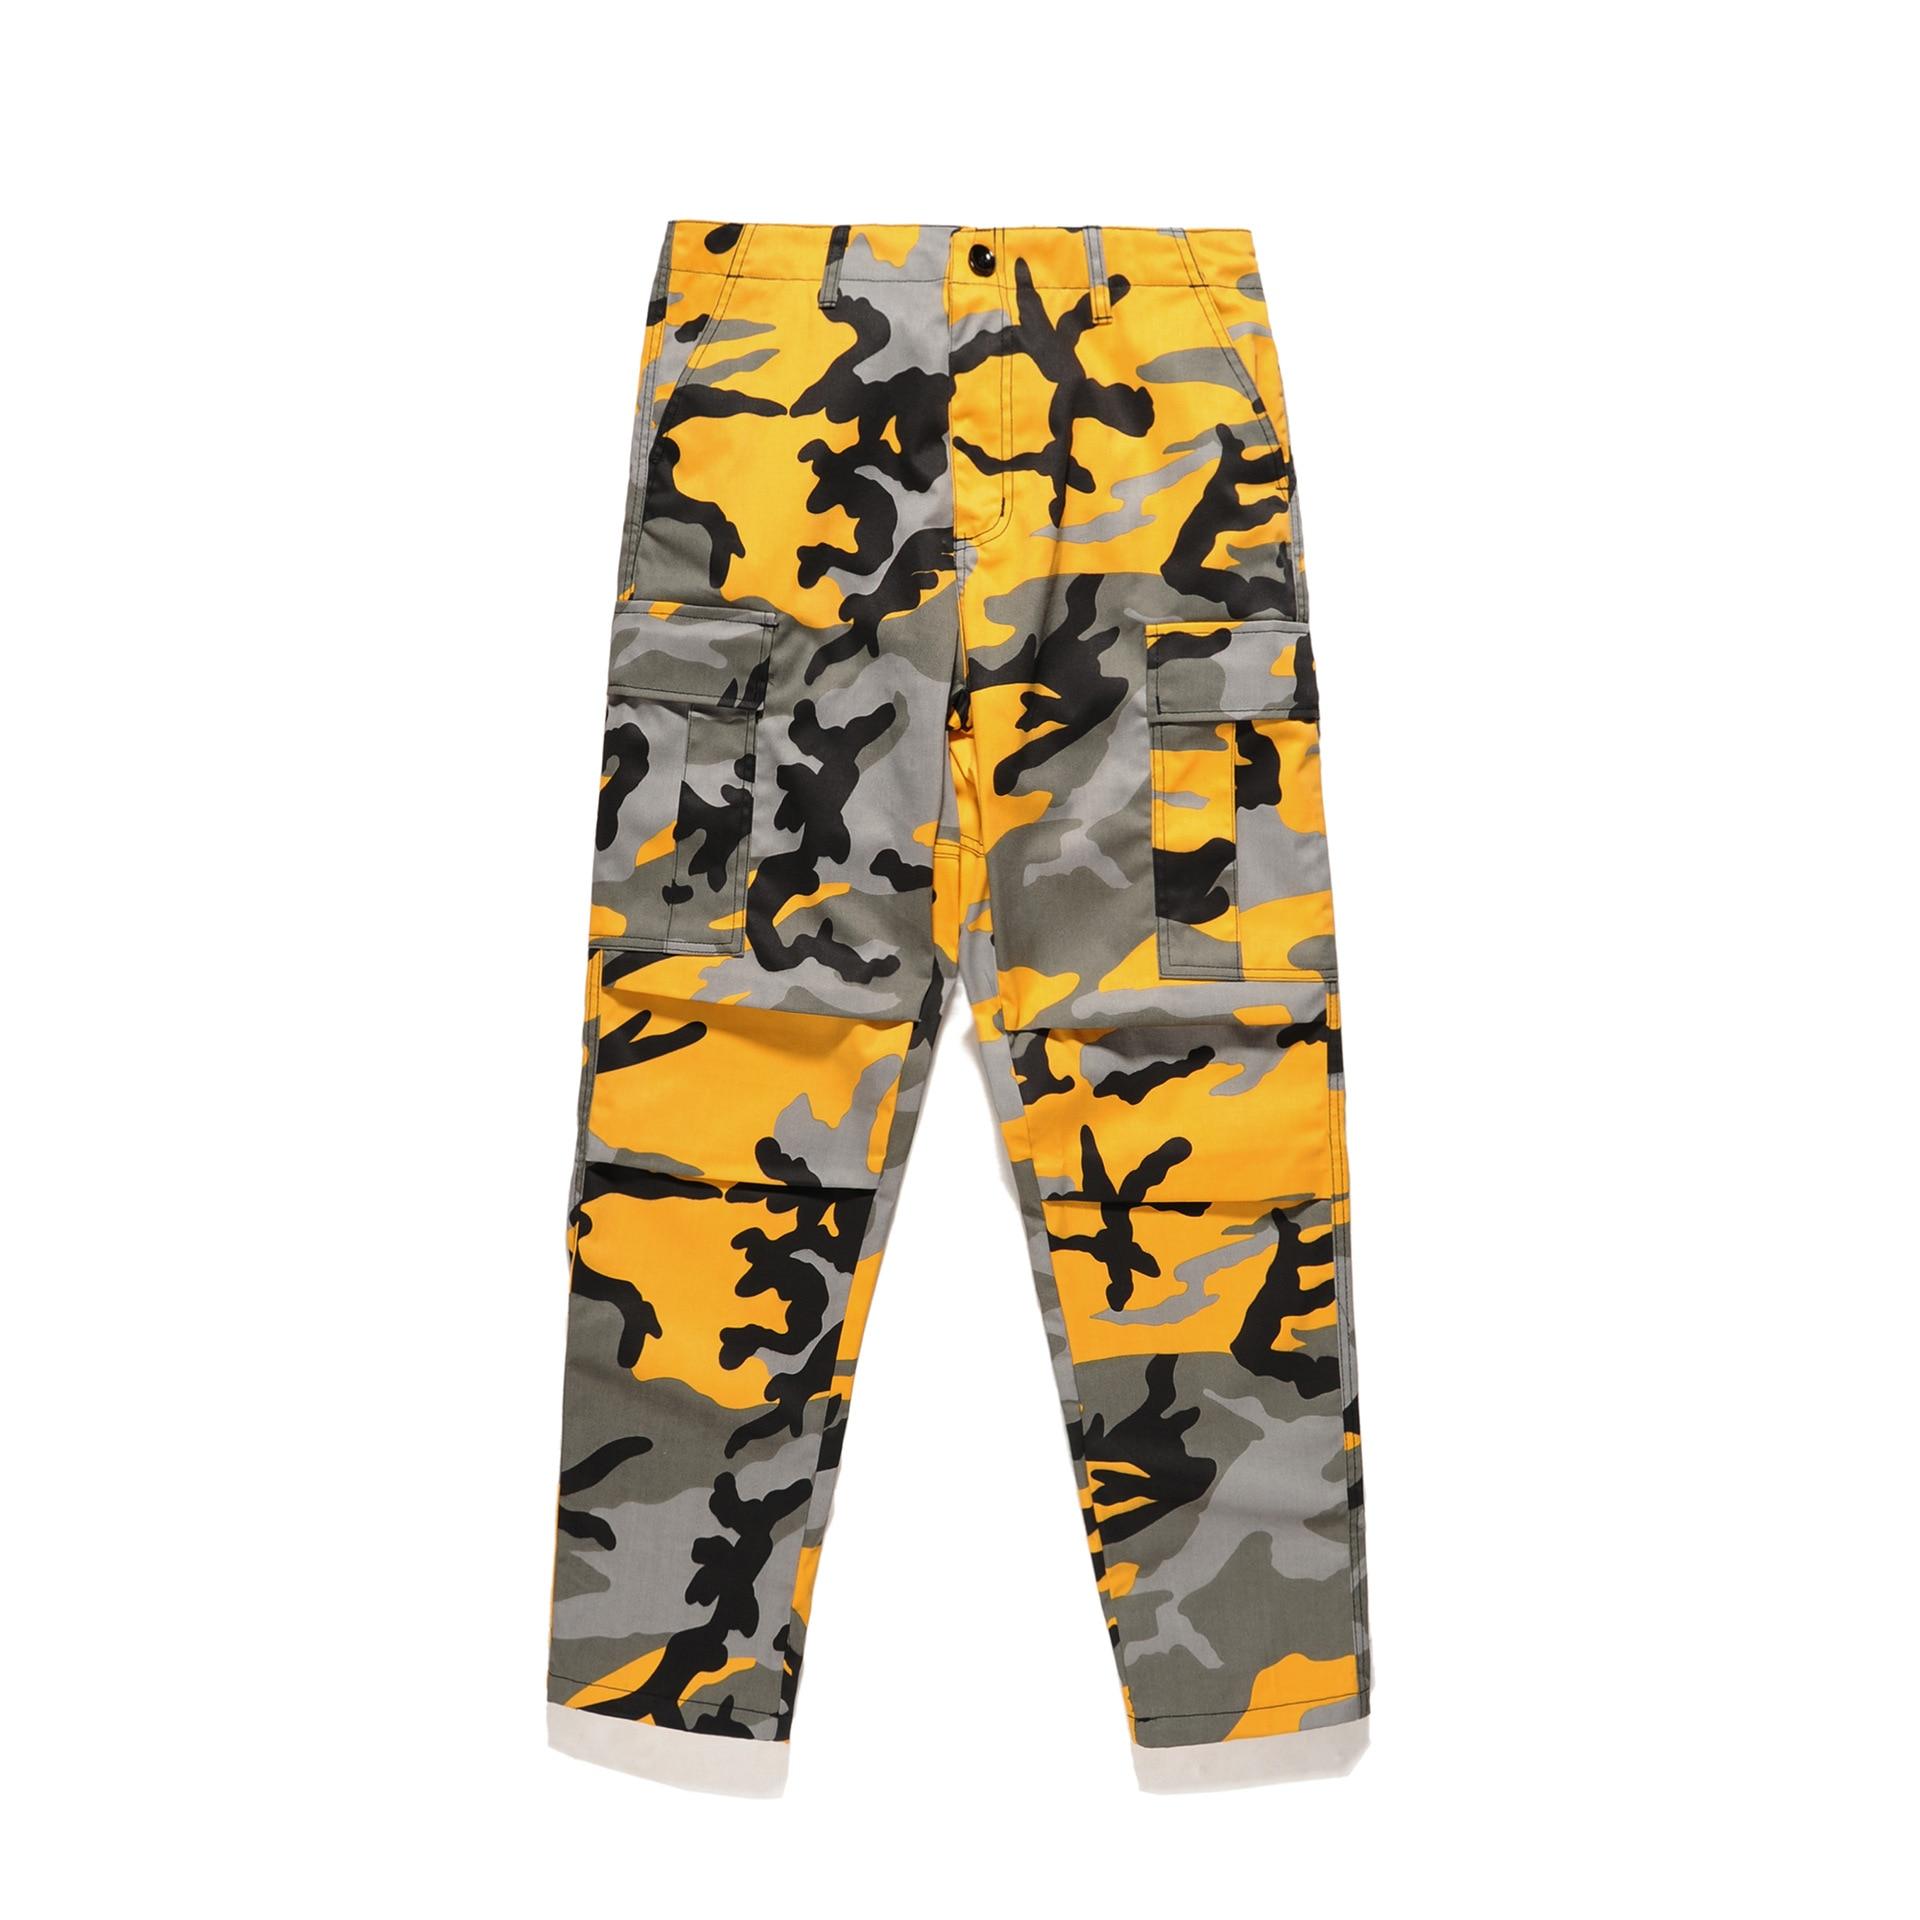 31dacceb8d 2018 Tri Color Camo Patchwork Cargo Pants Mens Hip Hop Casual Camouflage  Trousers Fashion Streetwear Joggers Sweatpants